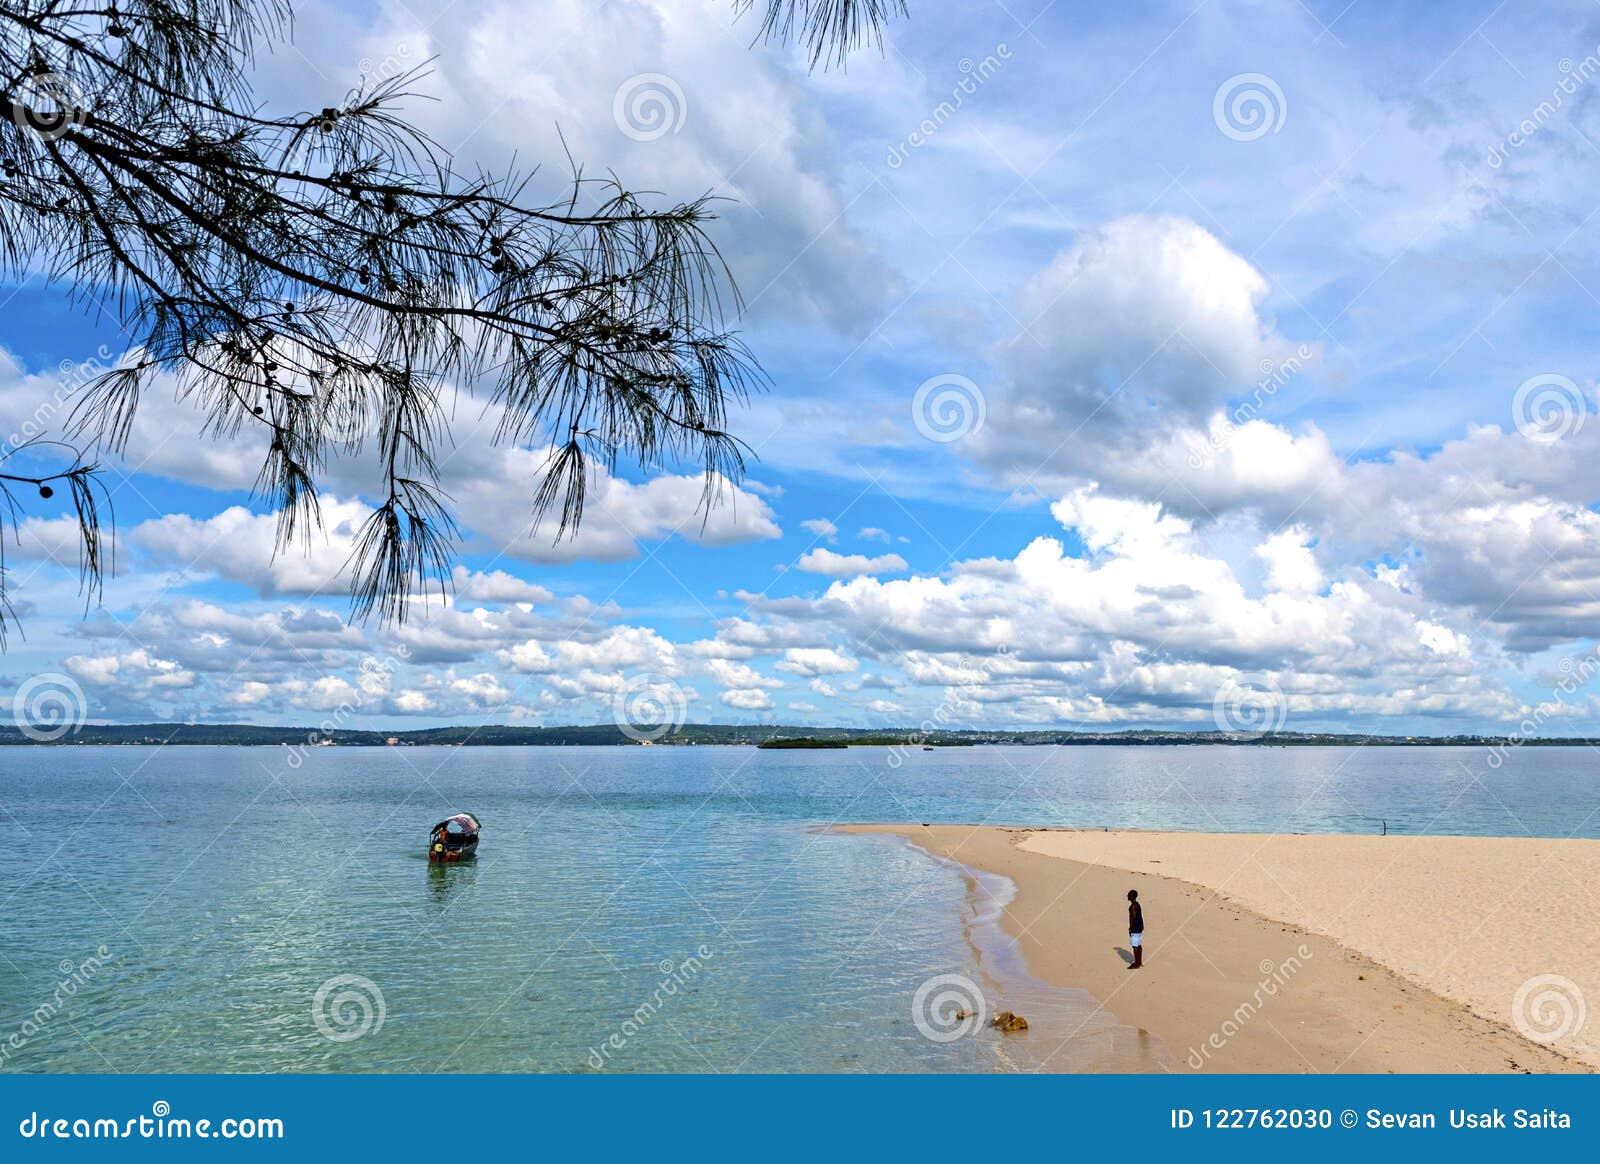 View of the Indian ocean. Traditional dhow boat on the water near beautiful beach of island Zanzibar. Tanzania